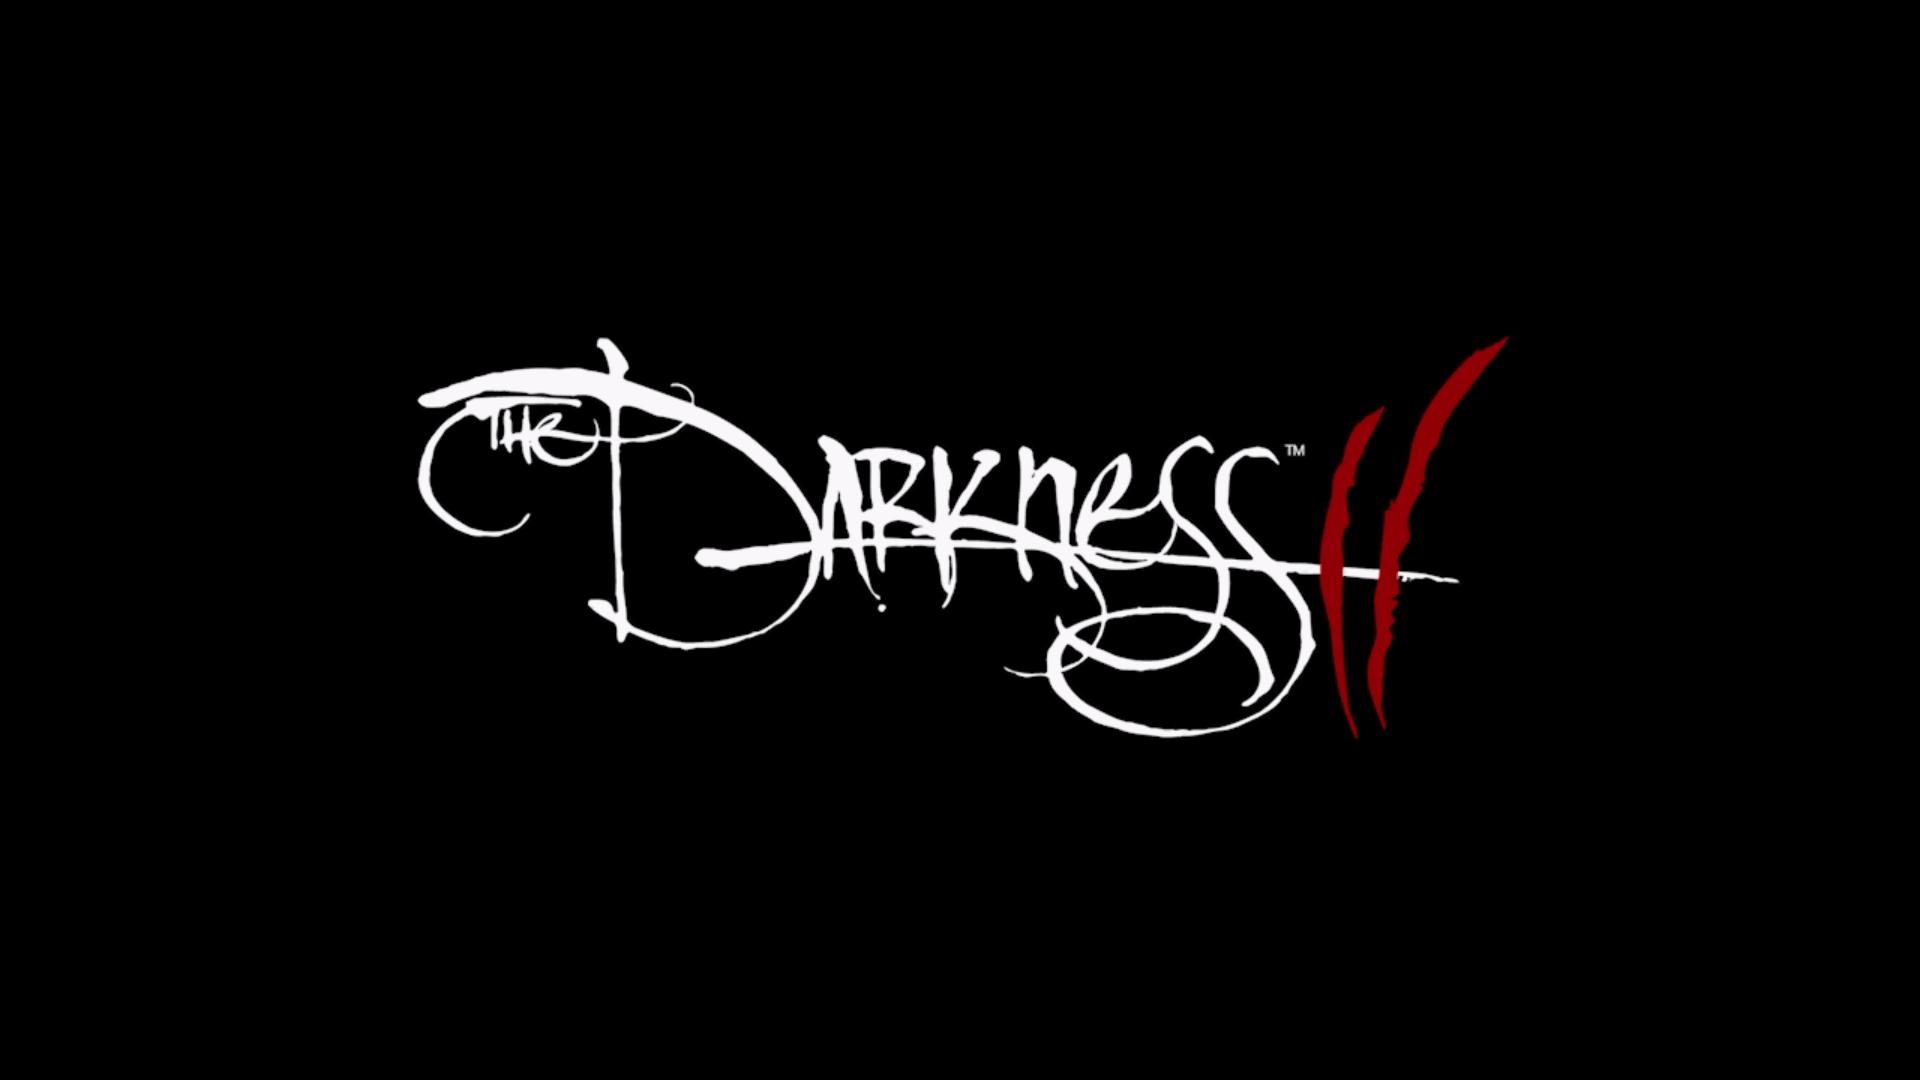 Joker Quotes Wallpaper Hd 1080p The Darkness Wallpapers Wallpaper Cave